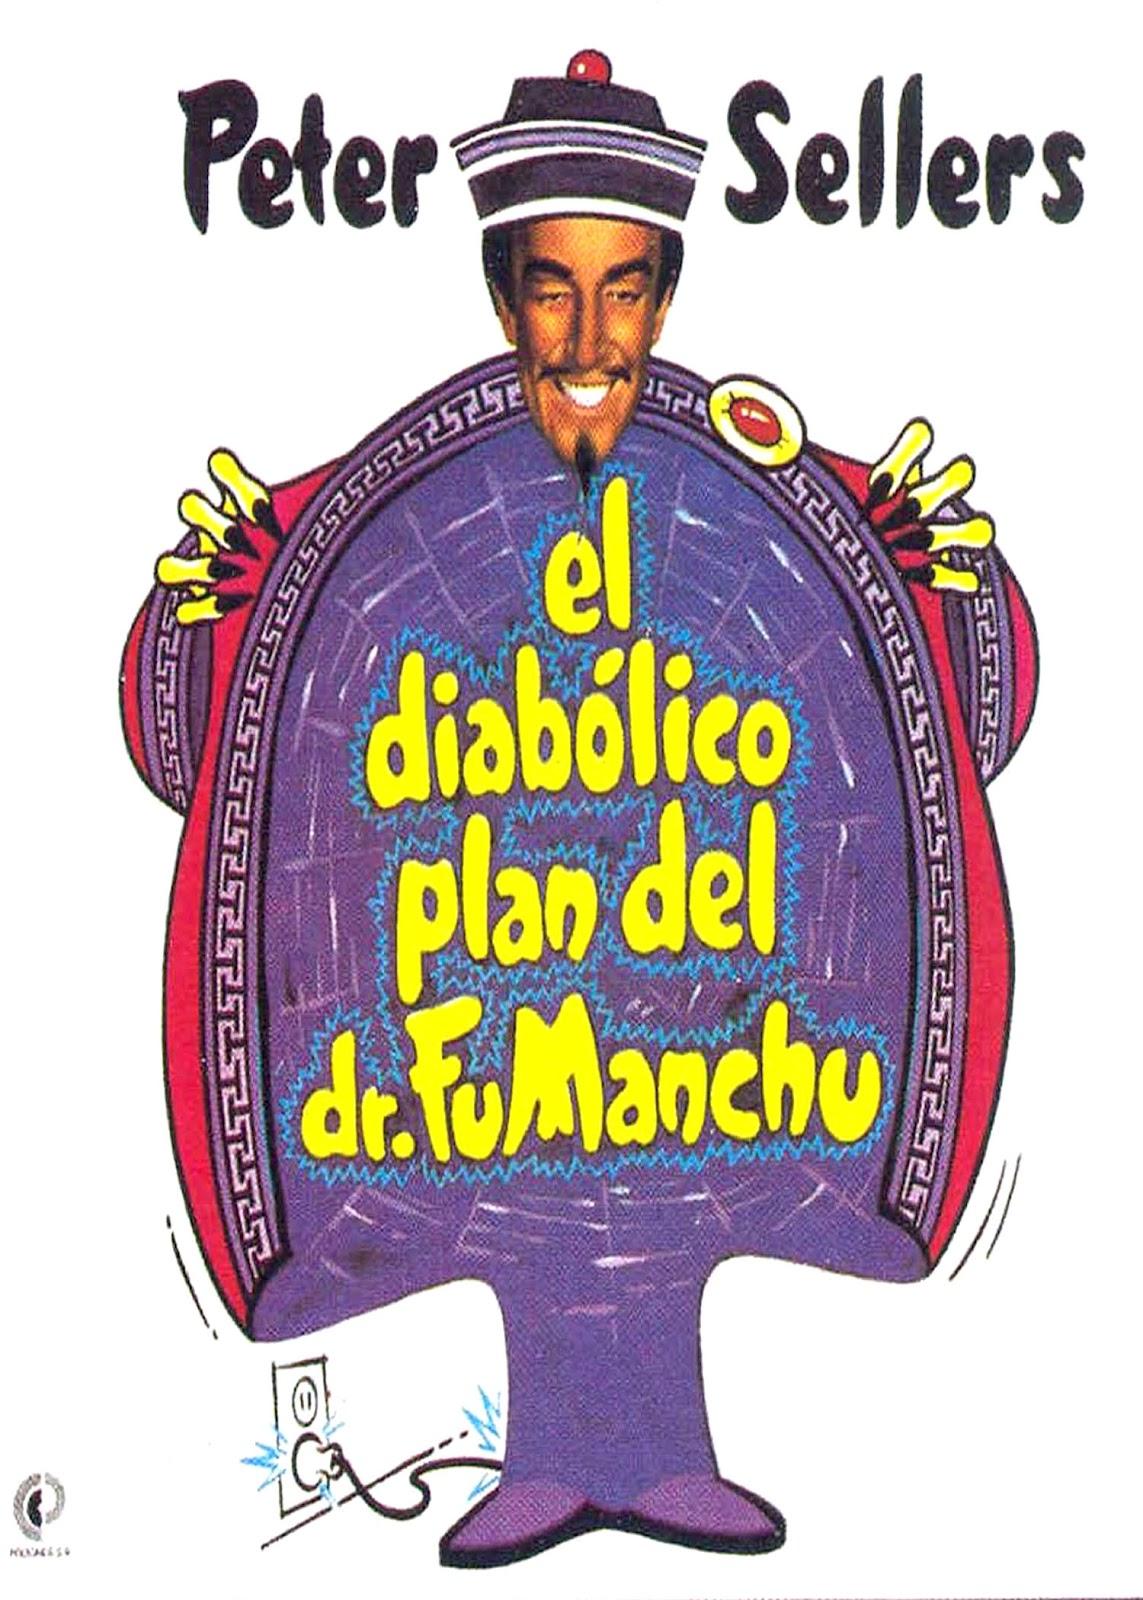 http://4.bp.blogspot.com/-GnEvzDiX4vI/T5MameNgXVI/AAAAAAAAHeI/oOp2KVNtC_s/s1600/El+Diabolico+Plan+Del+Dr+Fu+Manchu.jpg